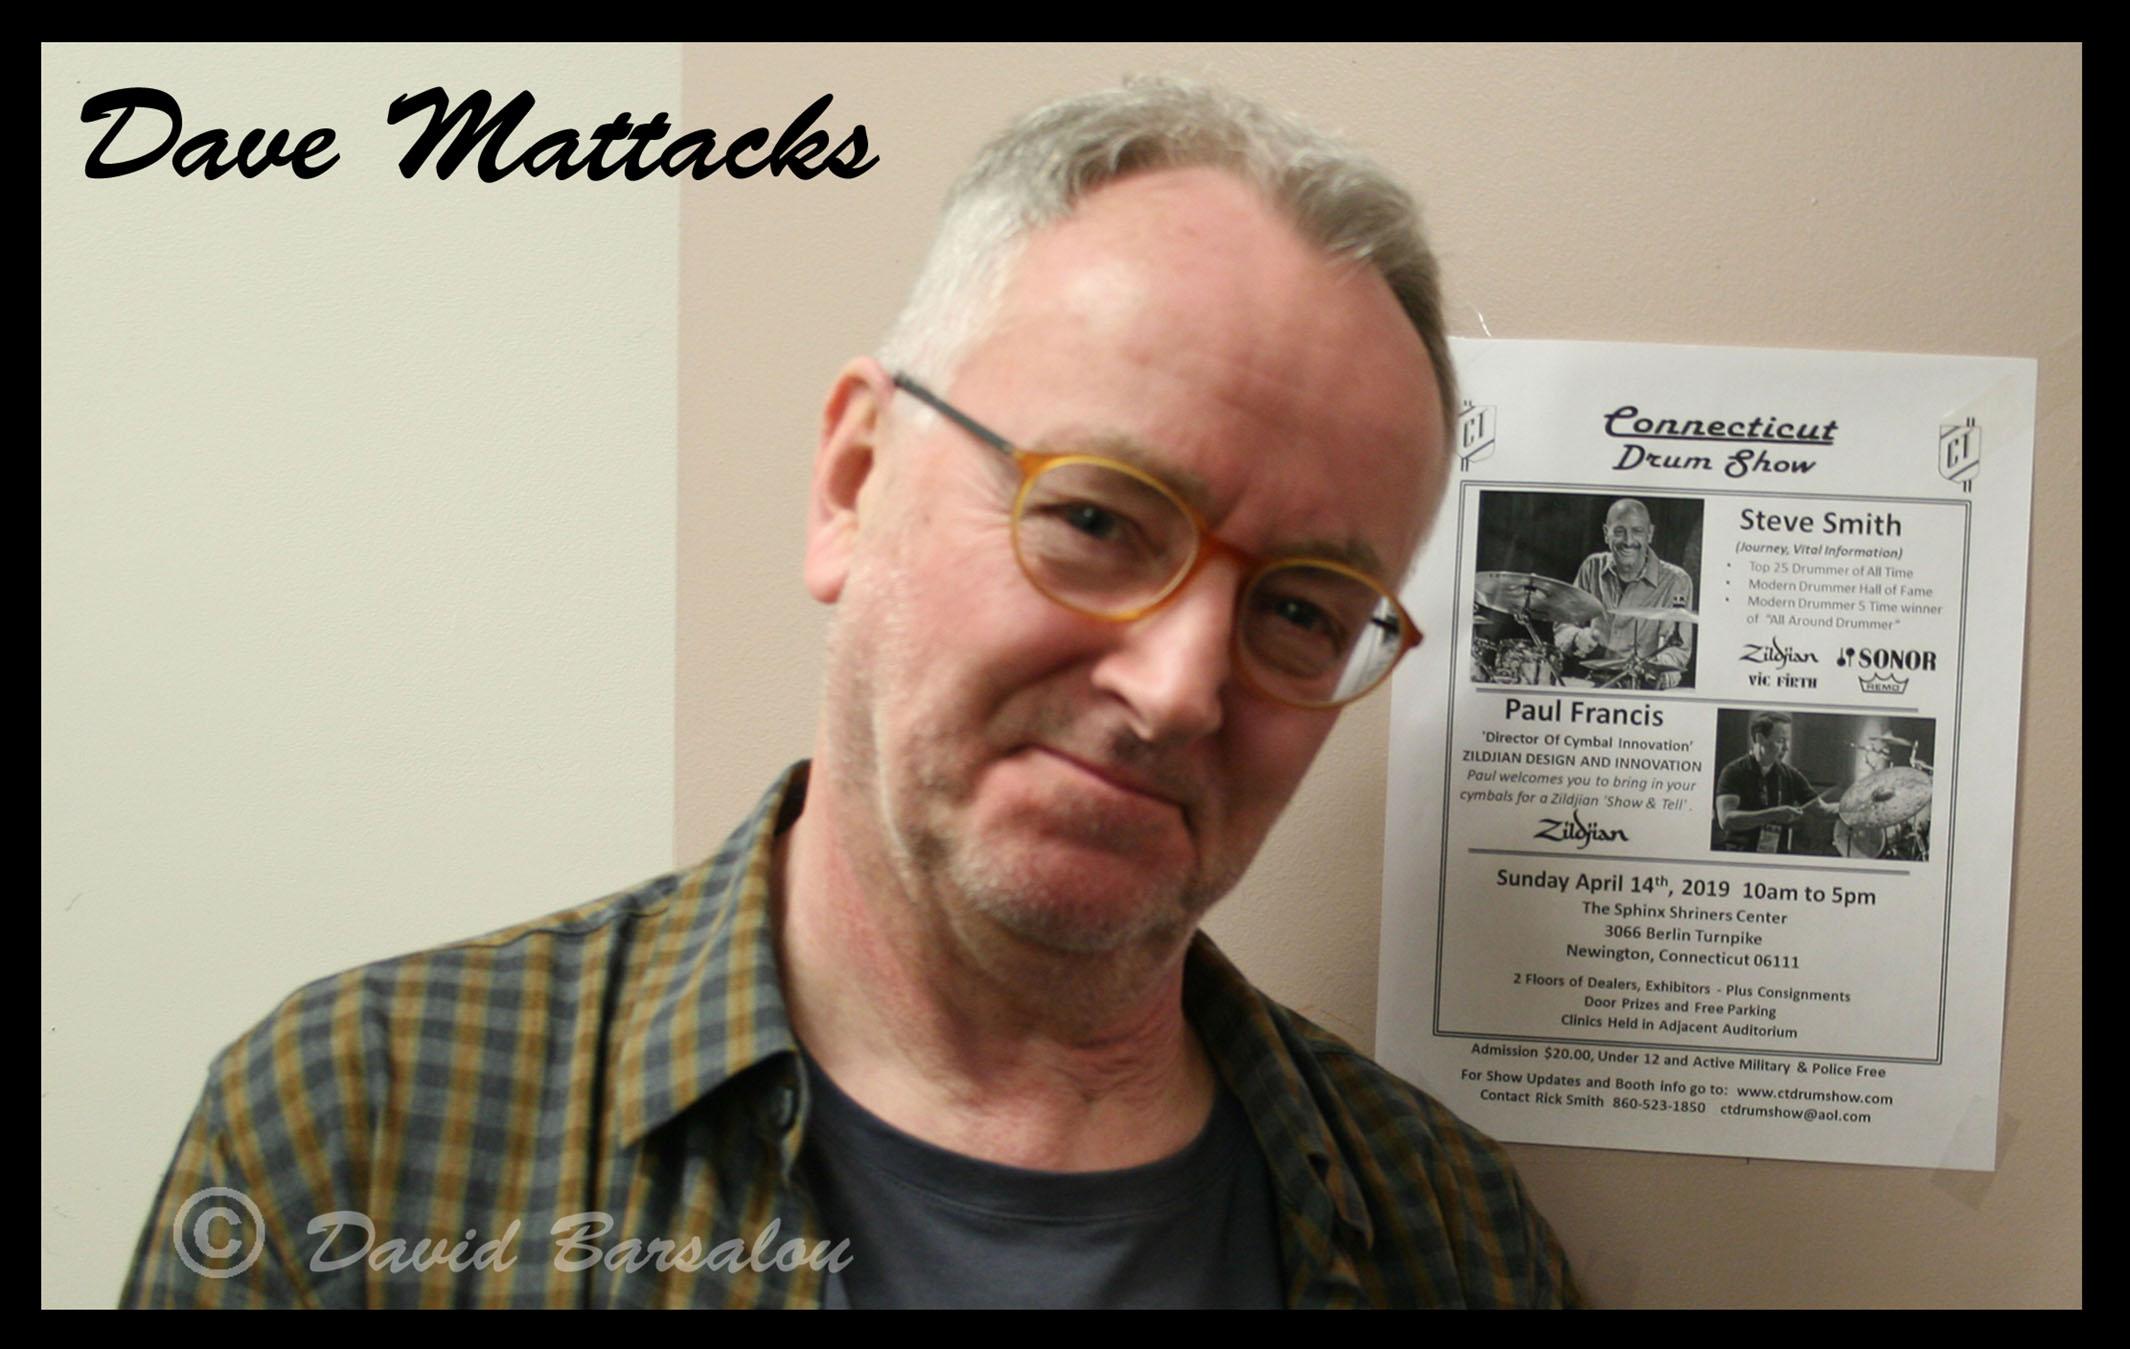 Final-Dave-Mattacks.jpg